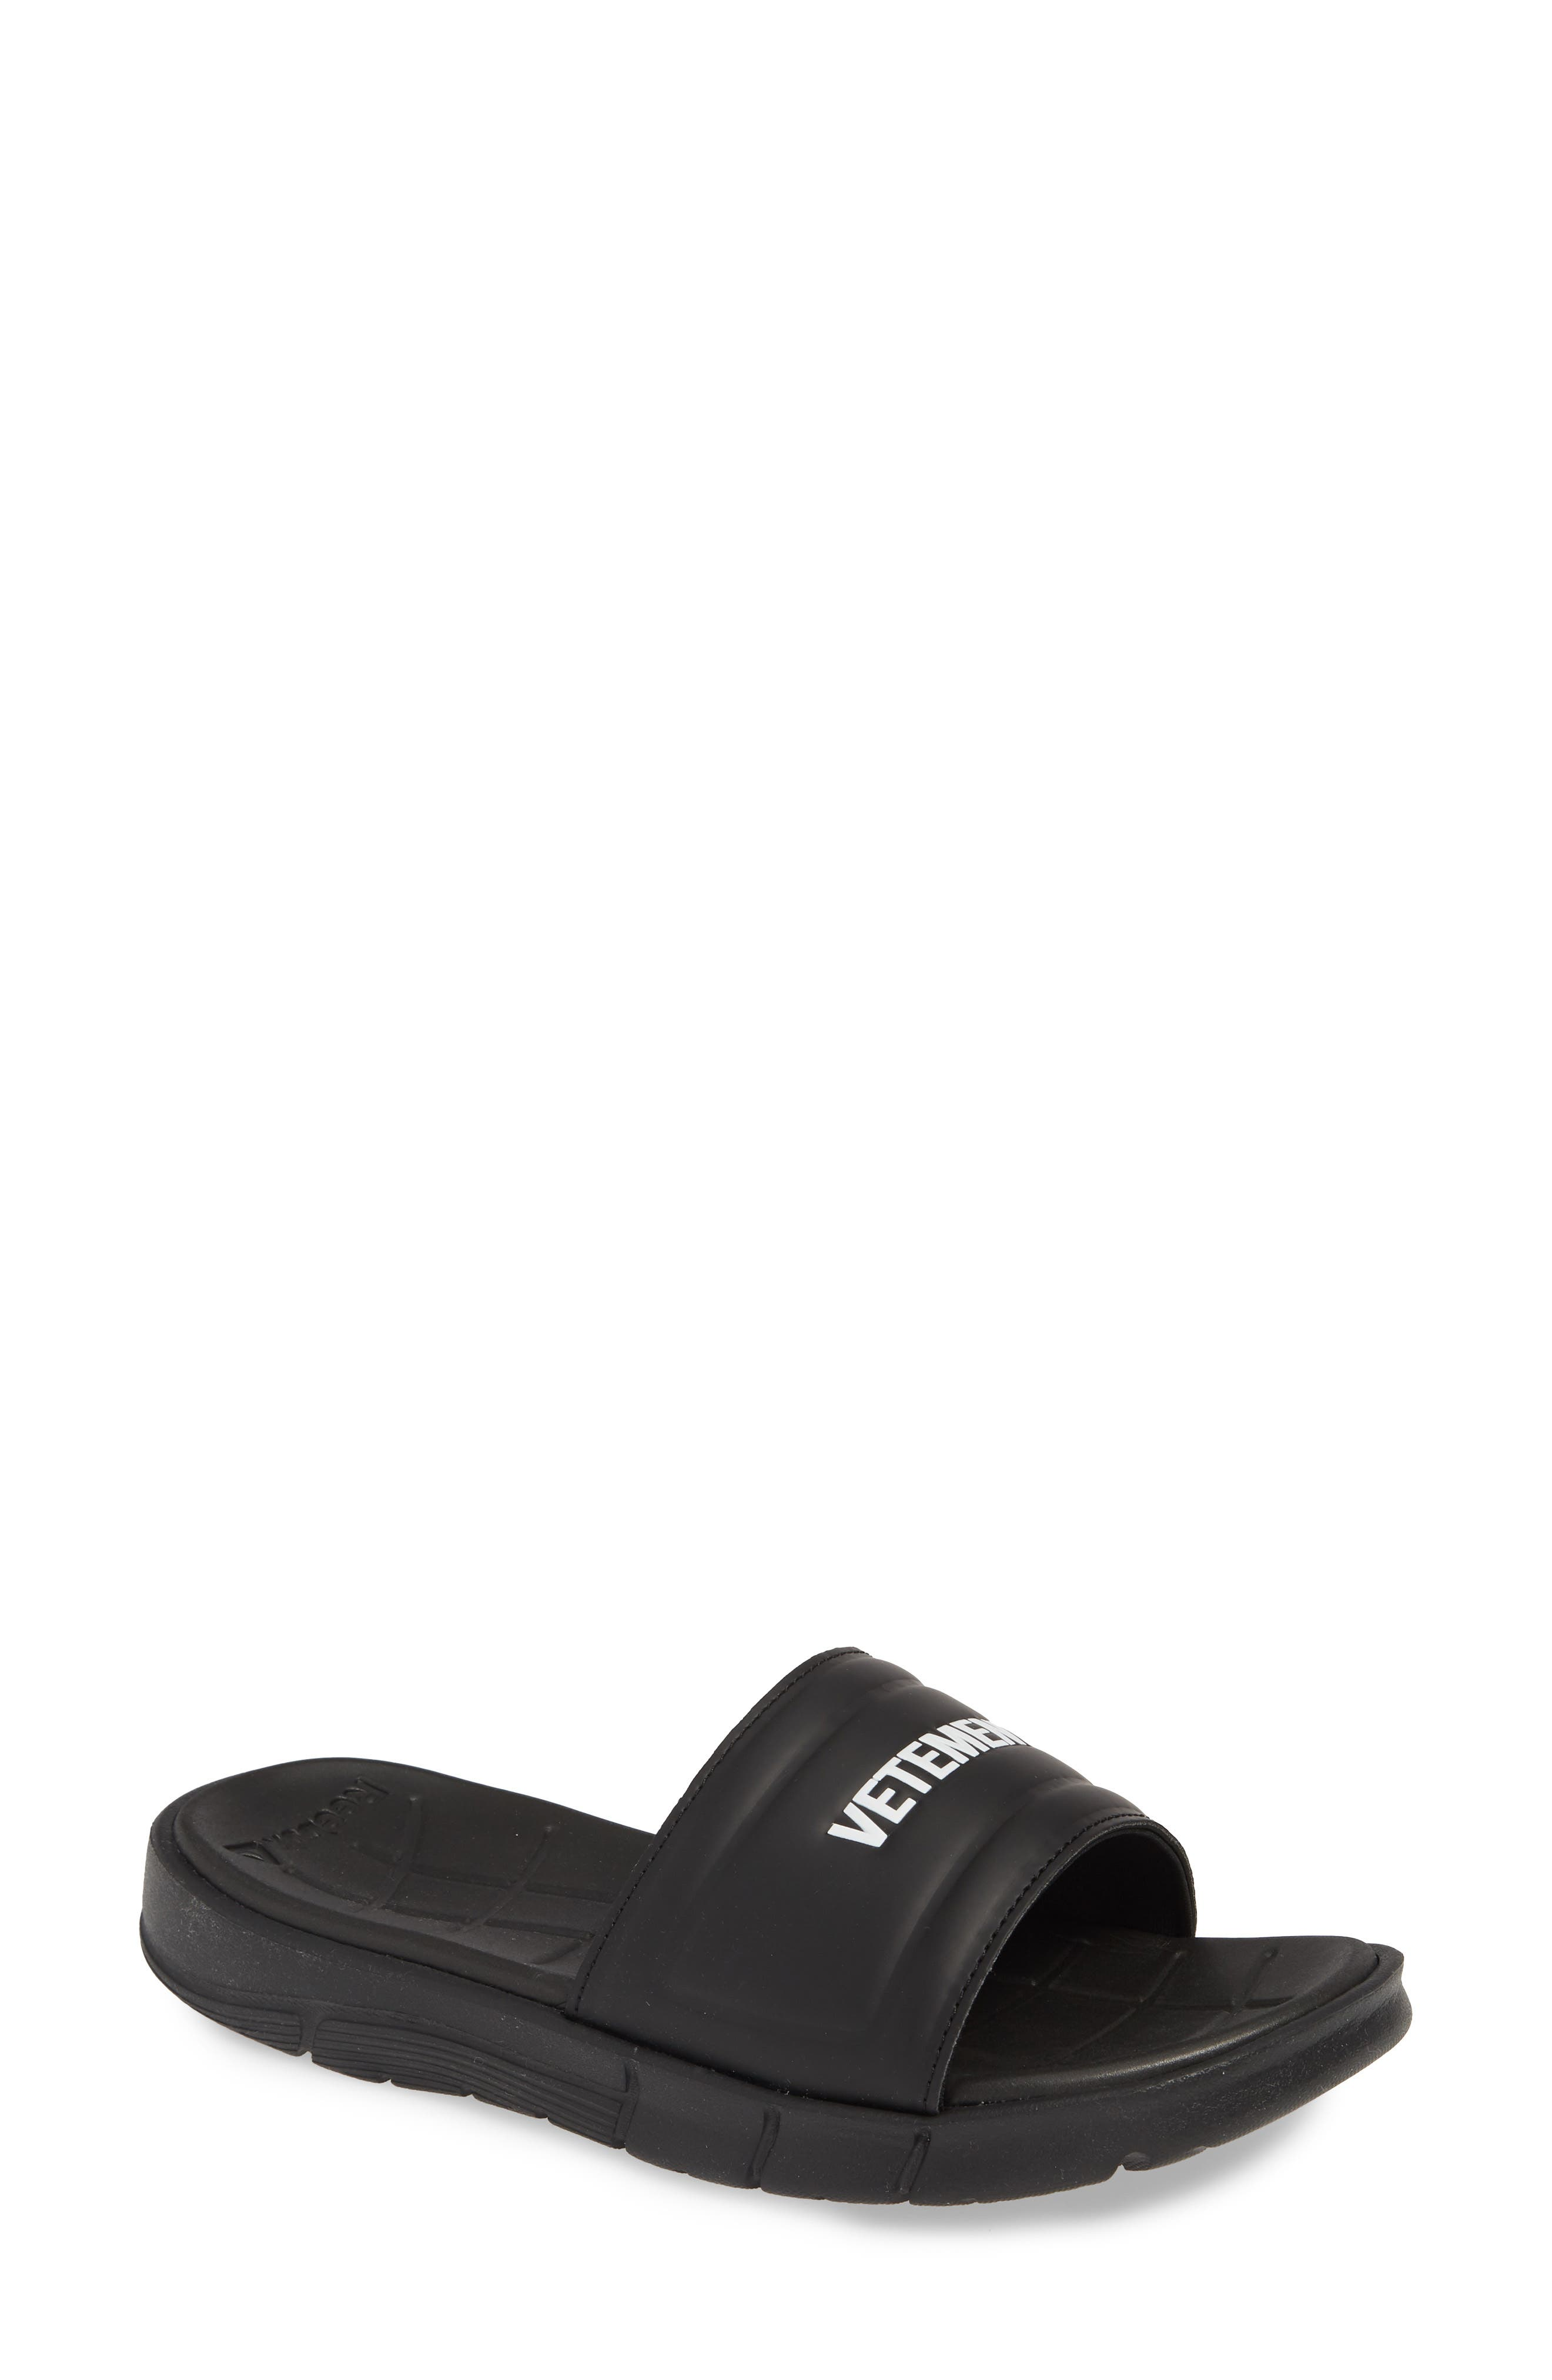 VETEMENTS, x Reebok Logo Slide Sandal, Main thumbnail 1, color, BLACK/ WHITE